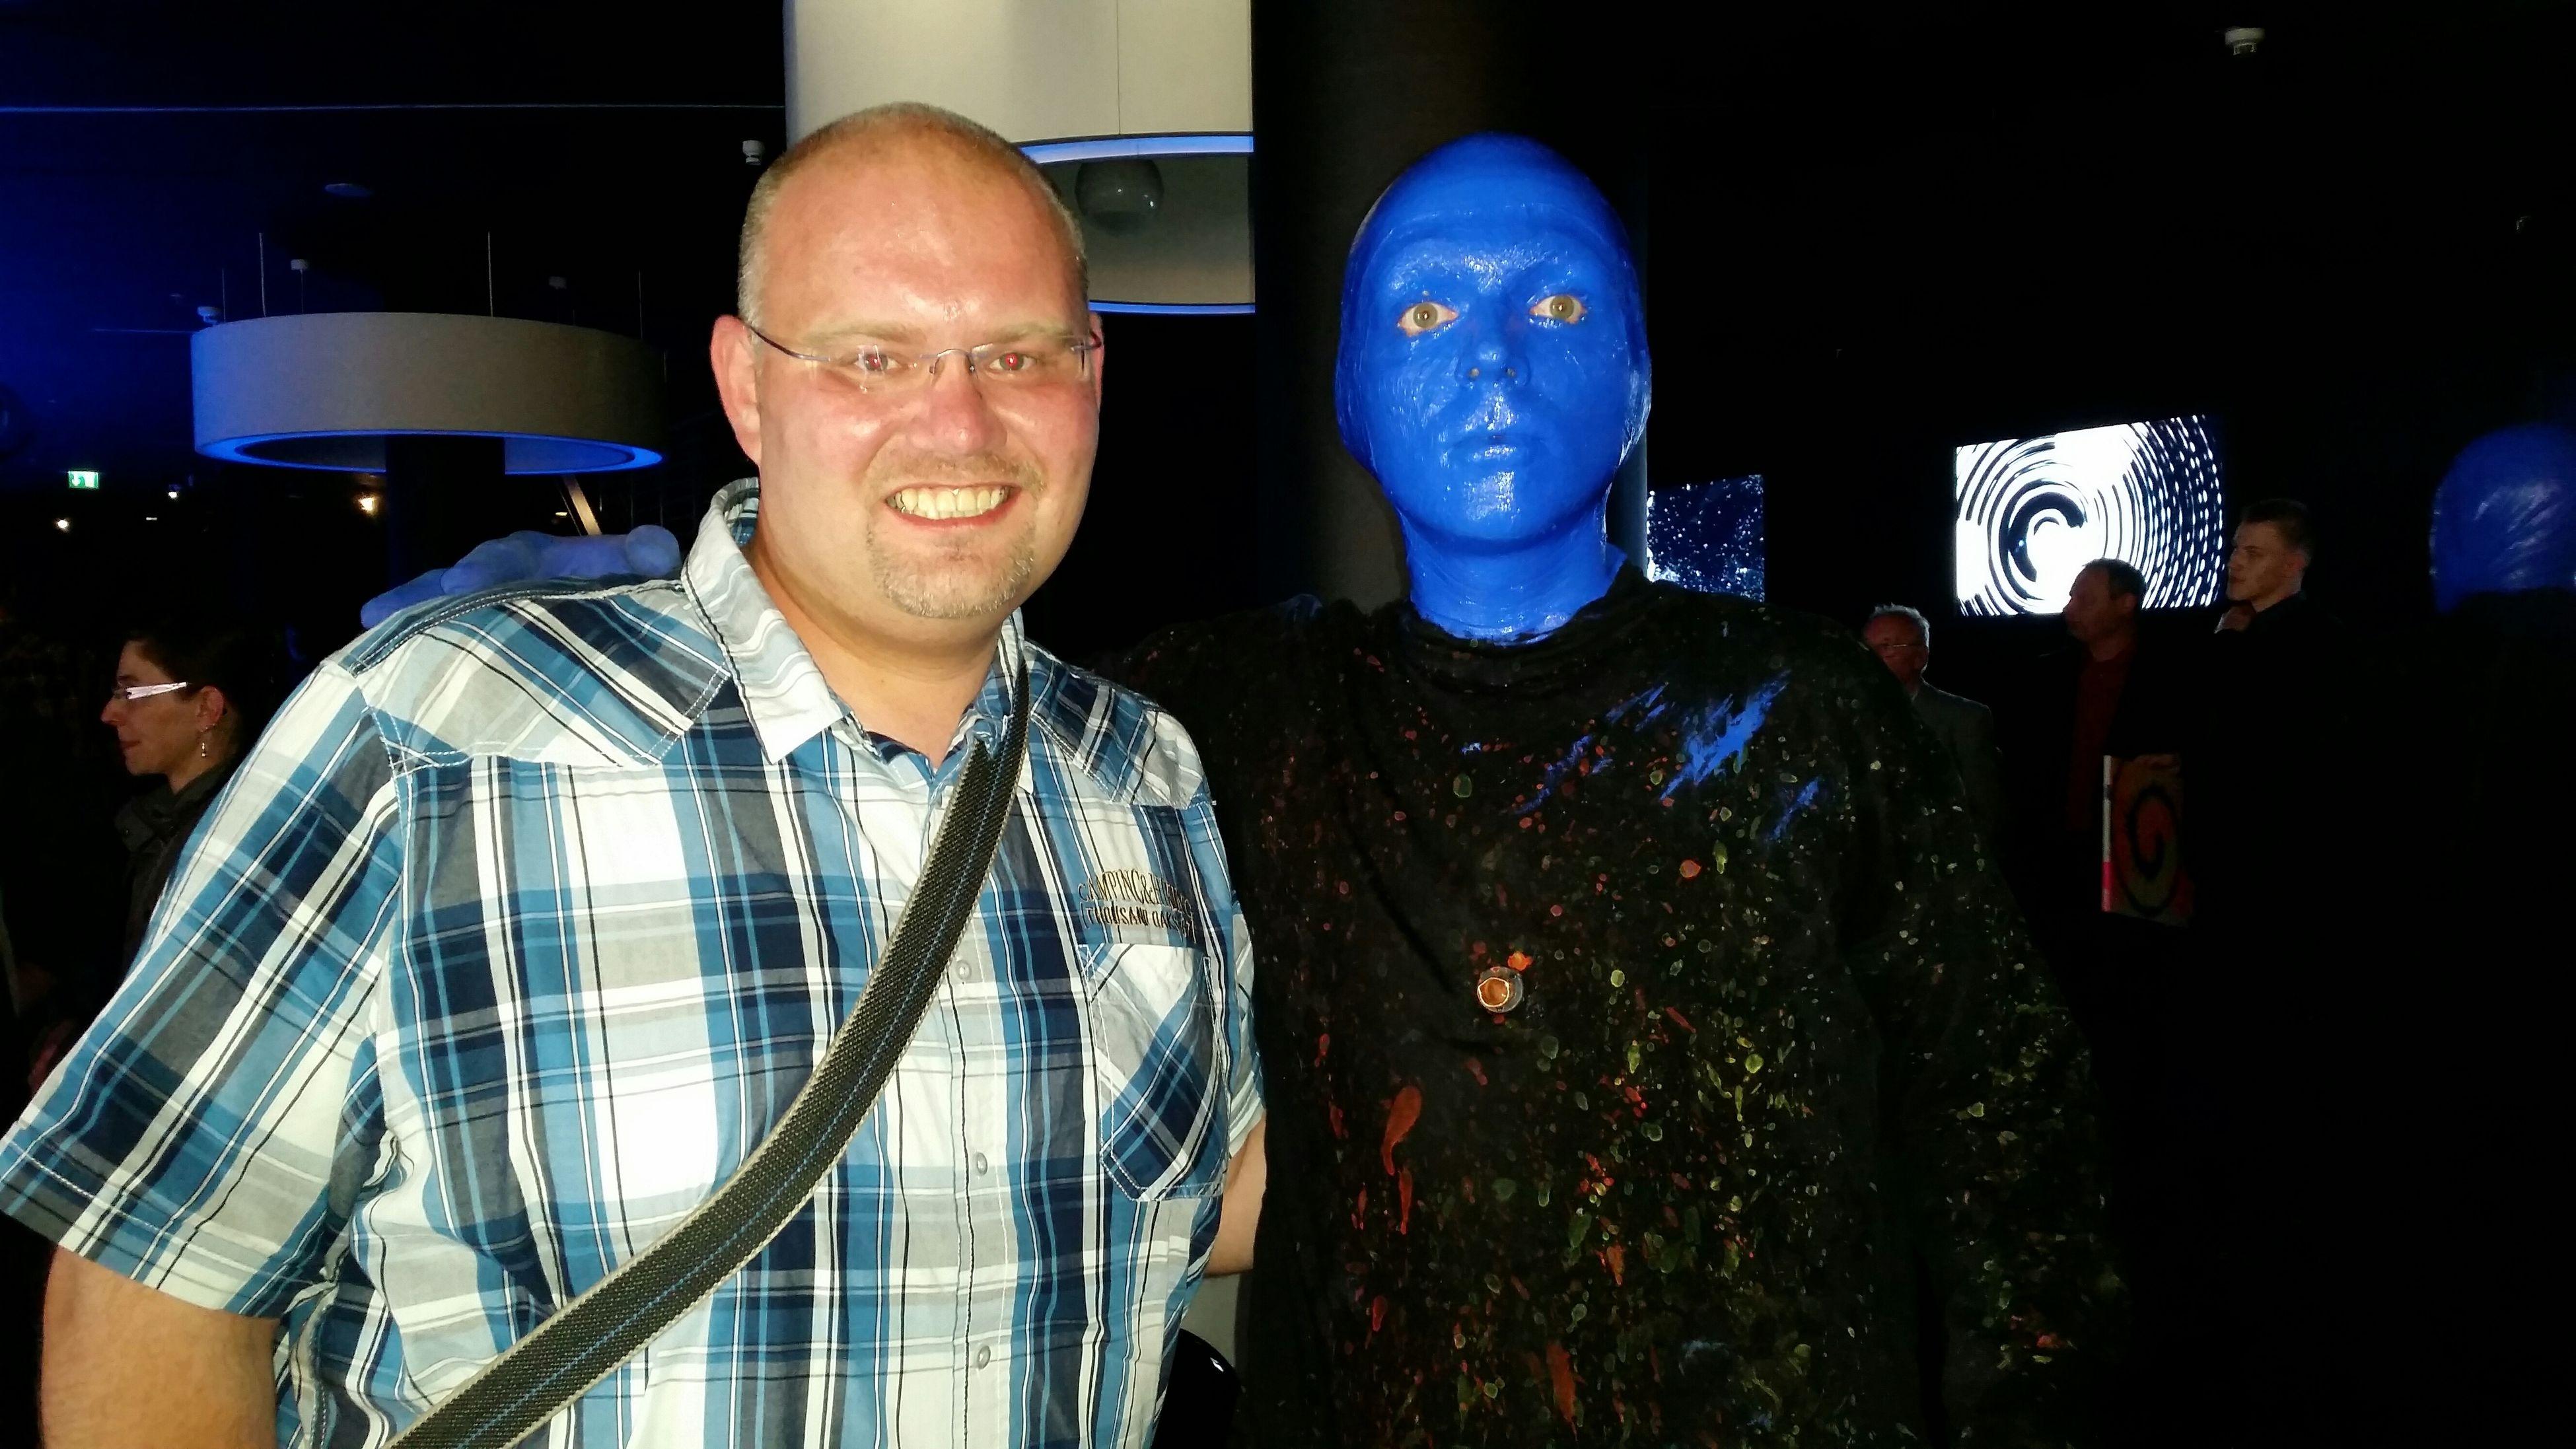 Berlin Bluemangroup Bluemax Blue Smile Picoftheday It's Me